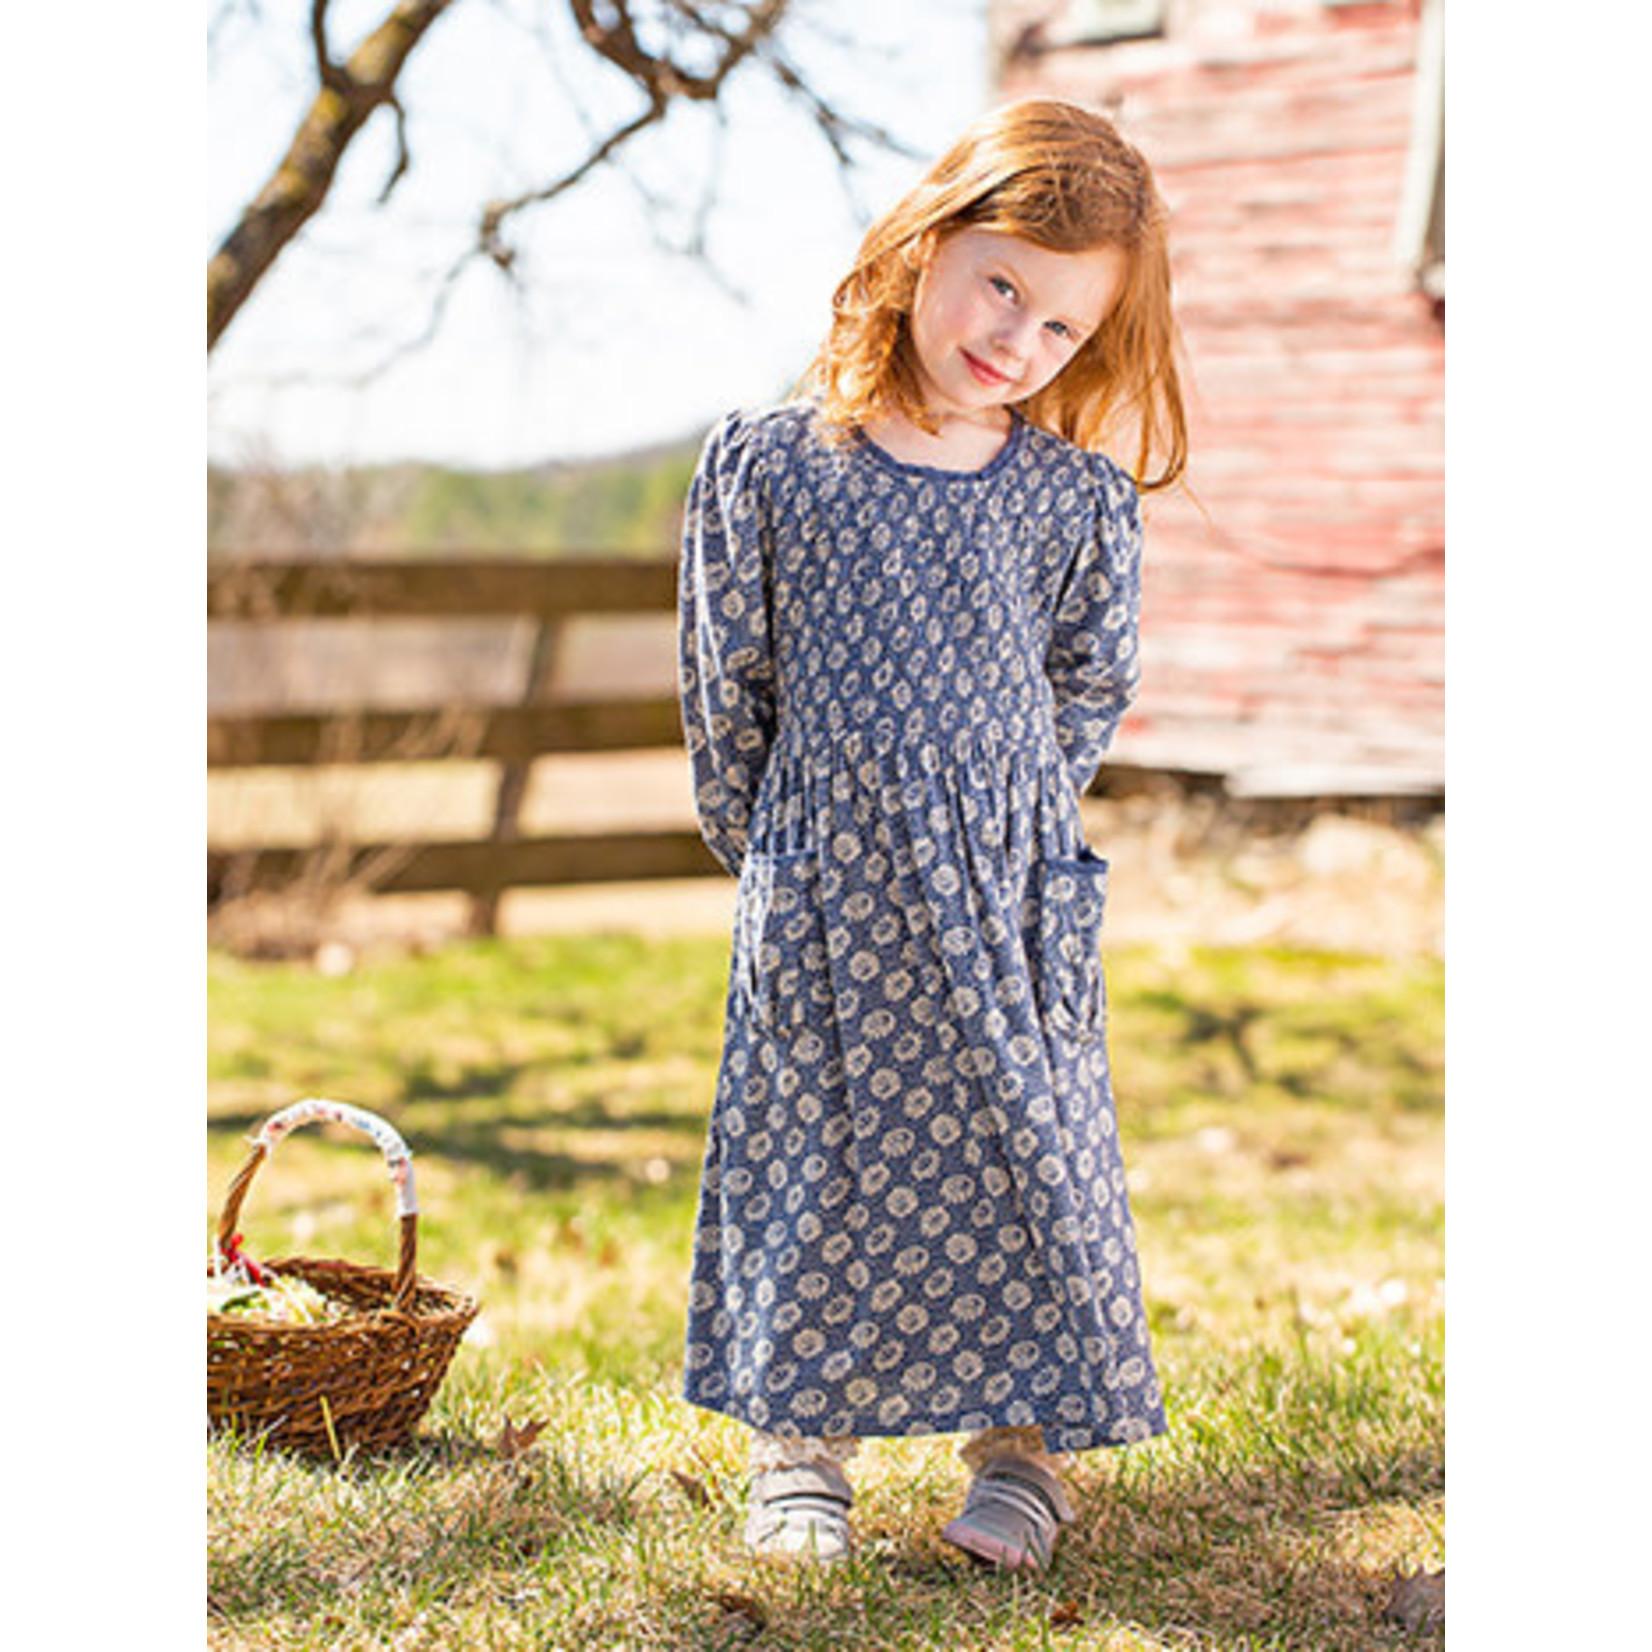 April Cornell Gwennie Dress